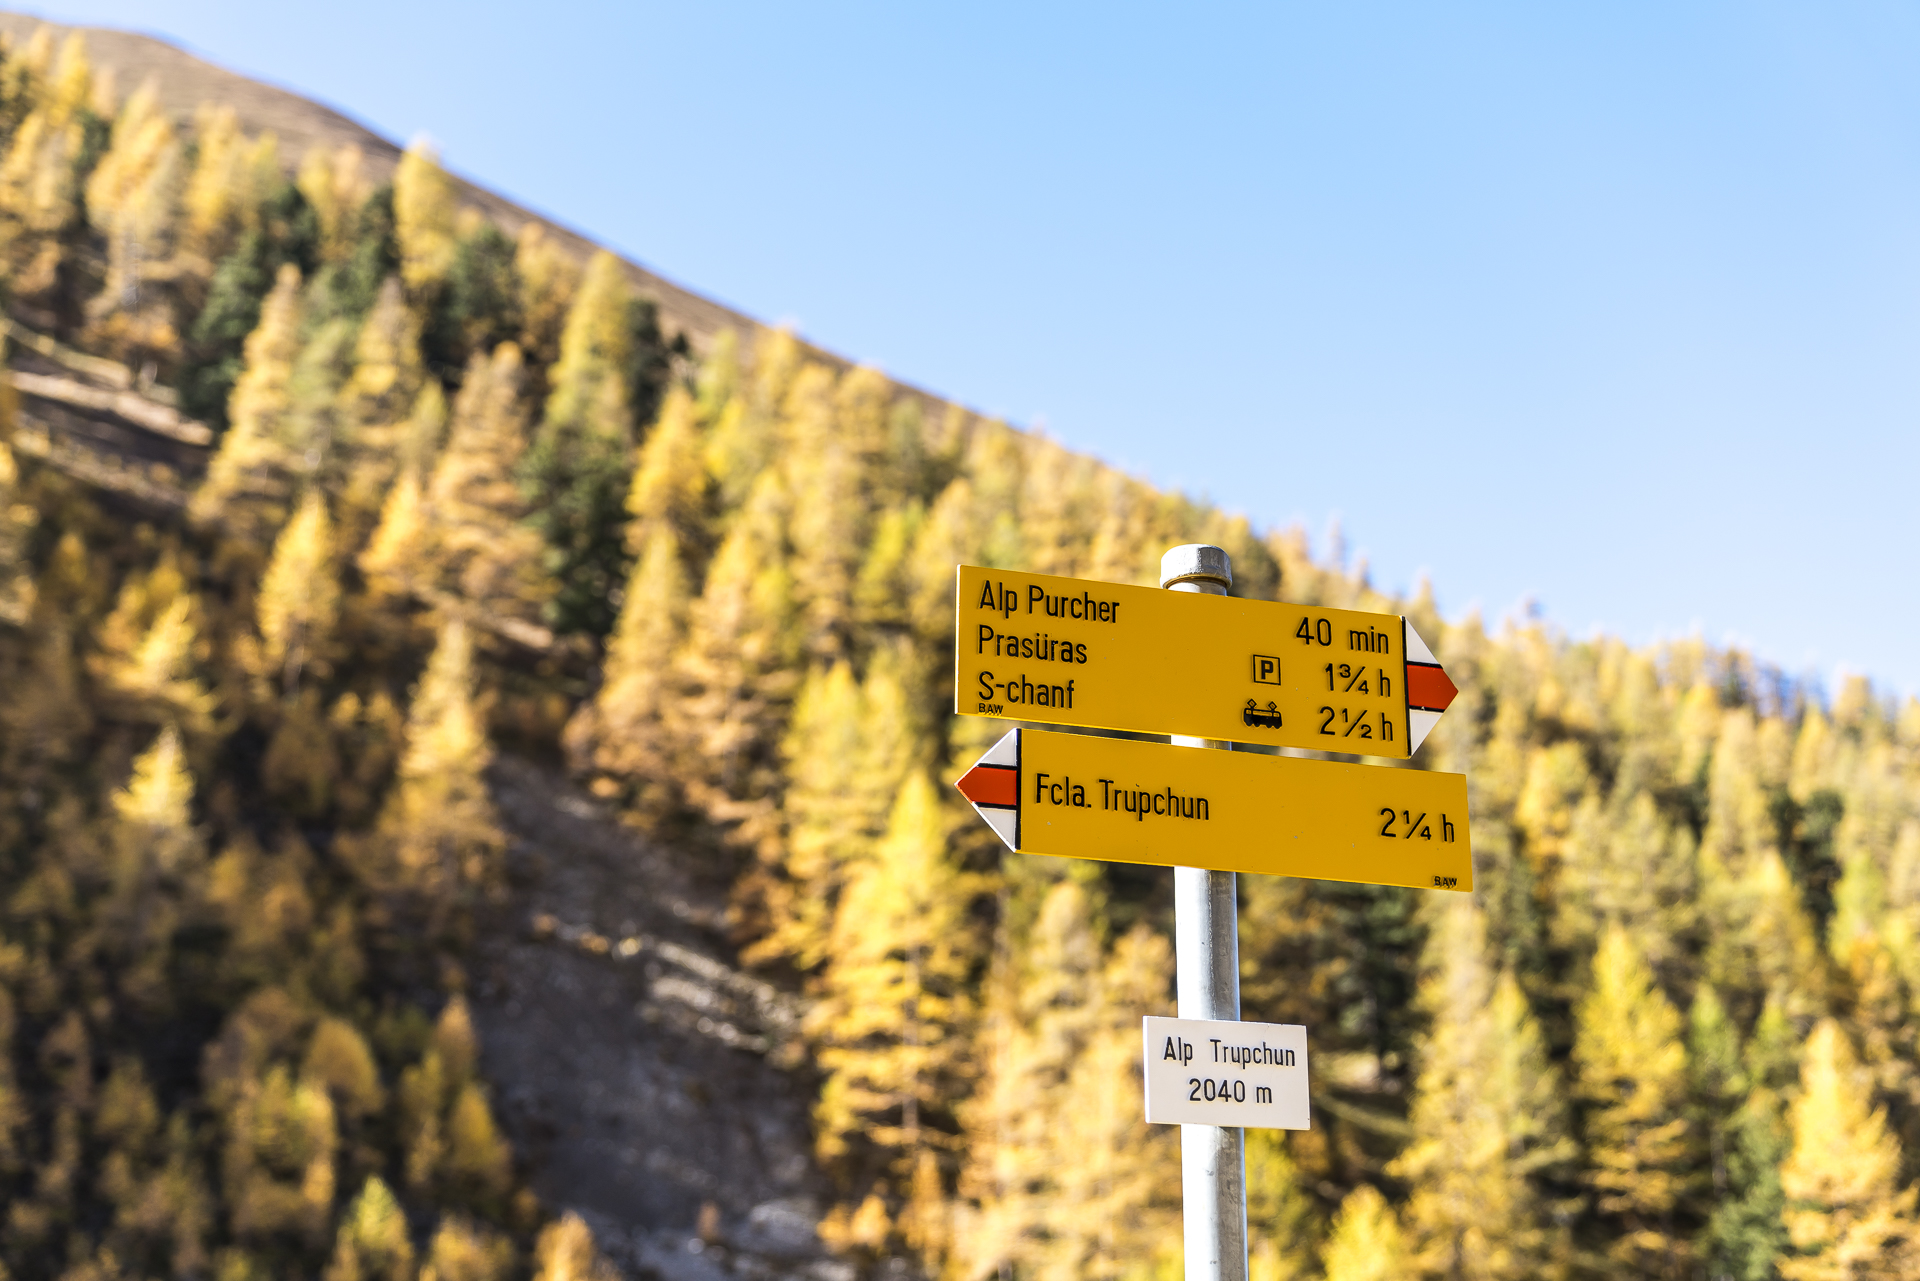 Alp Trupchun Wanderweg